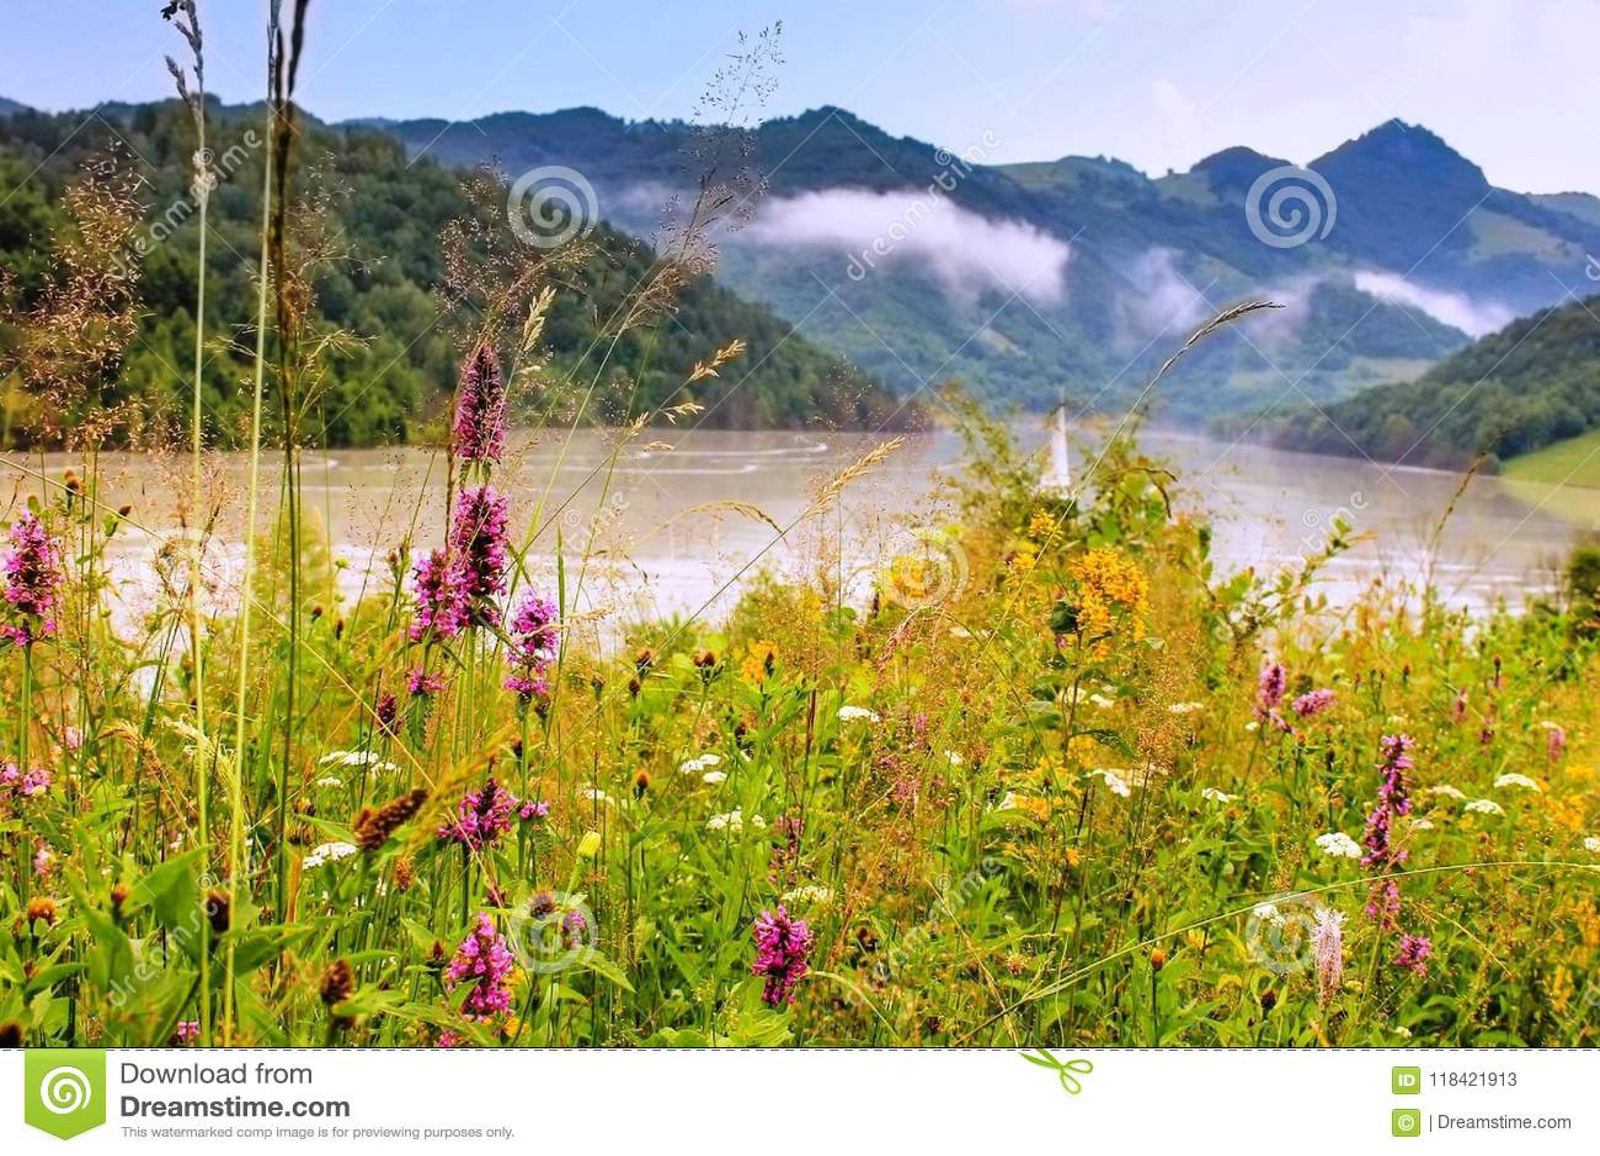 Nature Is The Art Of God Transylvania Stock Image Image Of Make